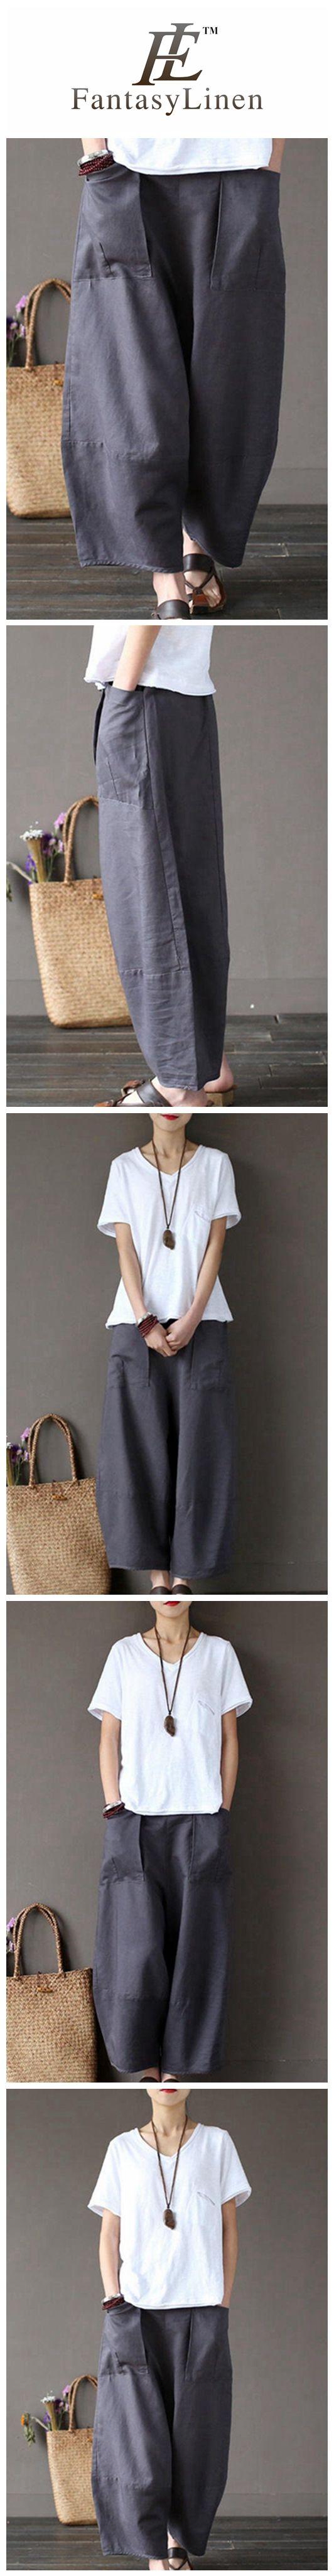 Gray Loose Cotton Linen Casual Ankle Length Pants Women Clothes P1203  P1203Gray